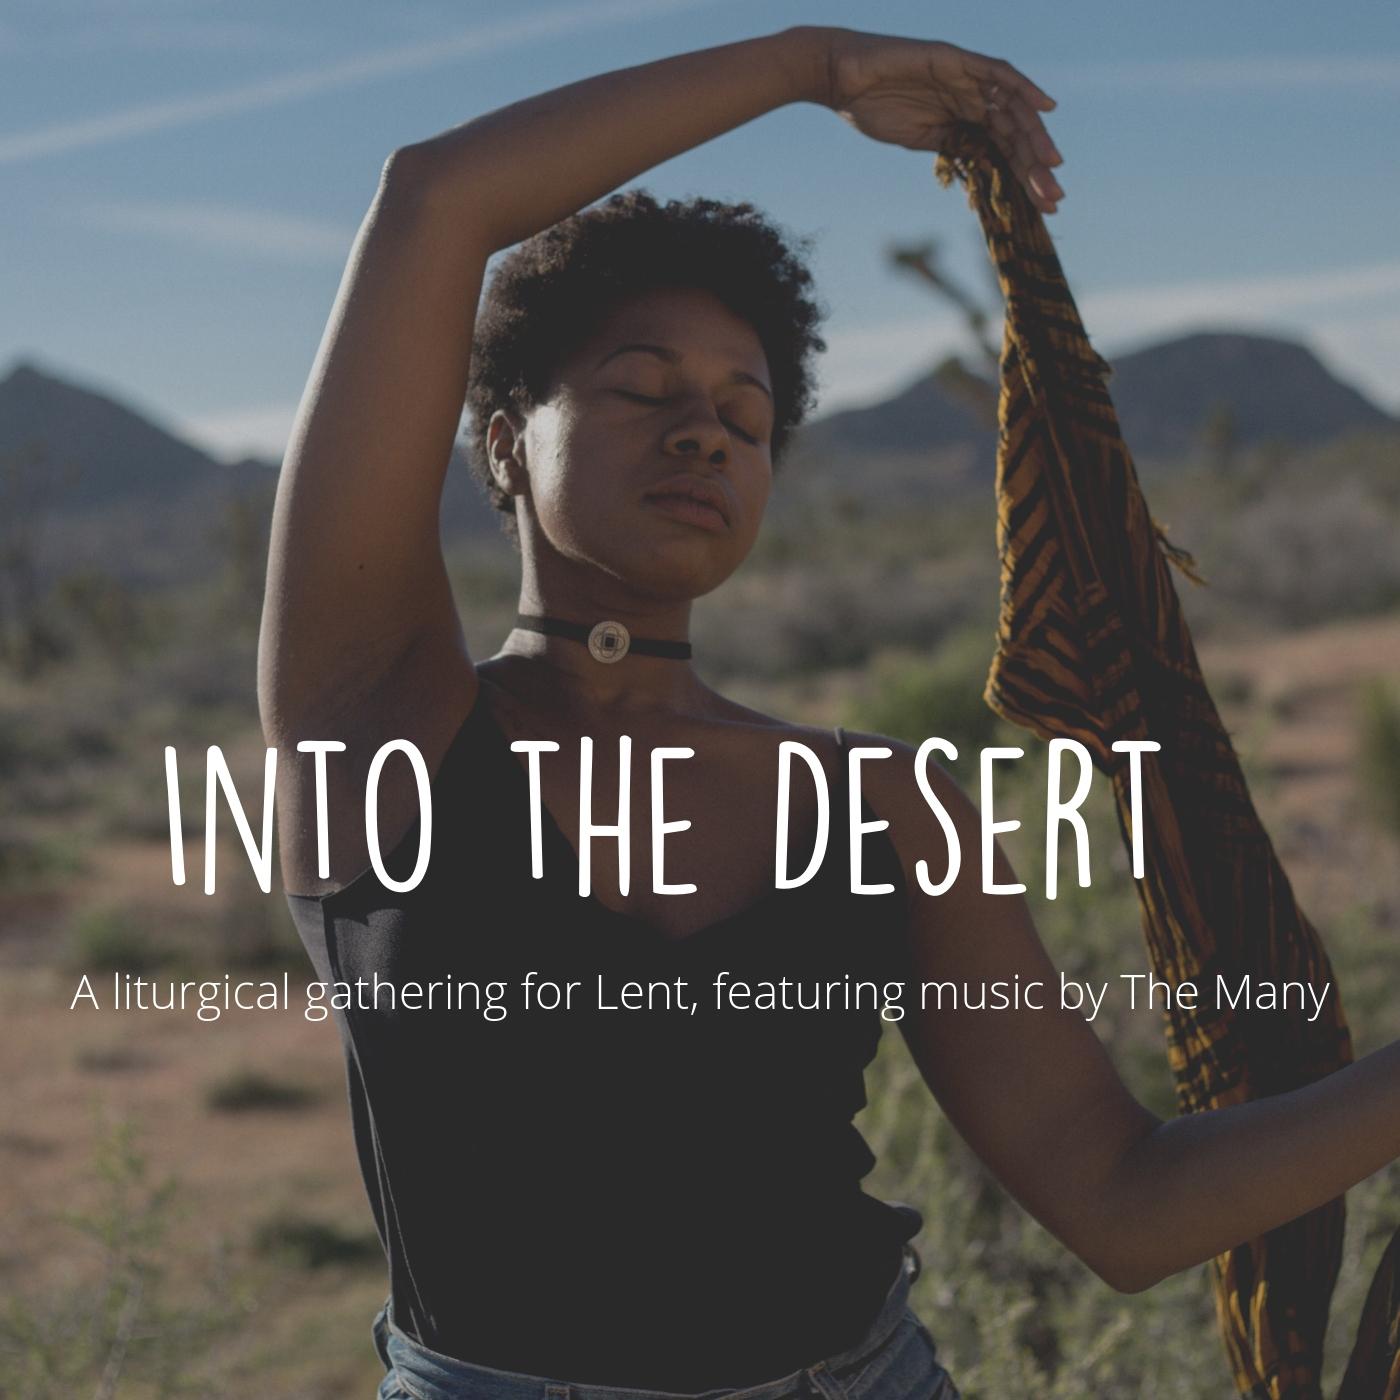 Copy of into the desert liturgy cover.jpg